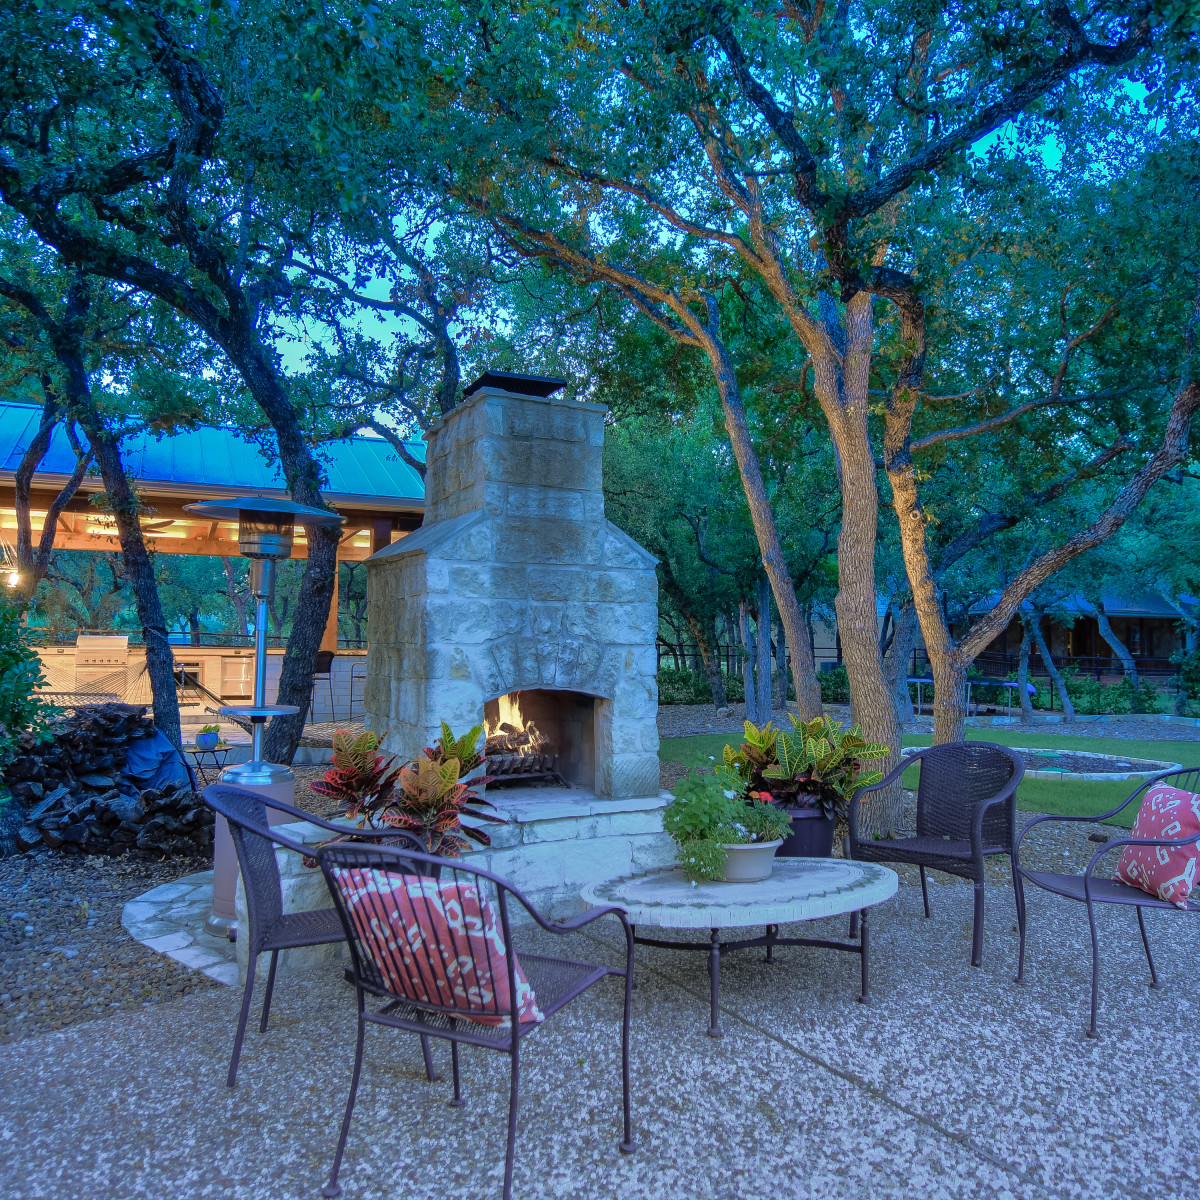 San Antonio house_1406 Dover Ln